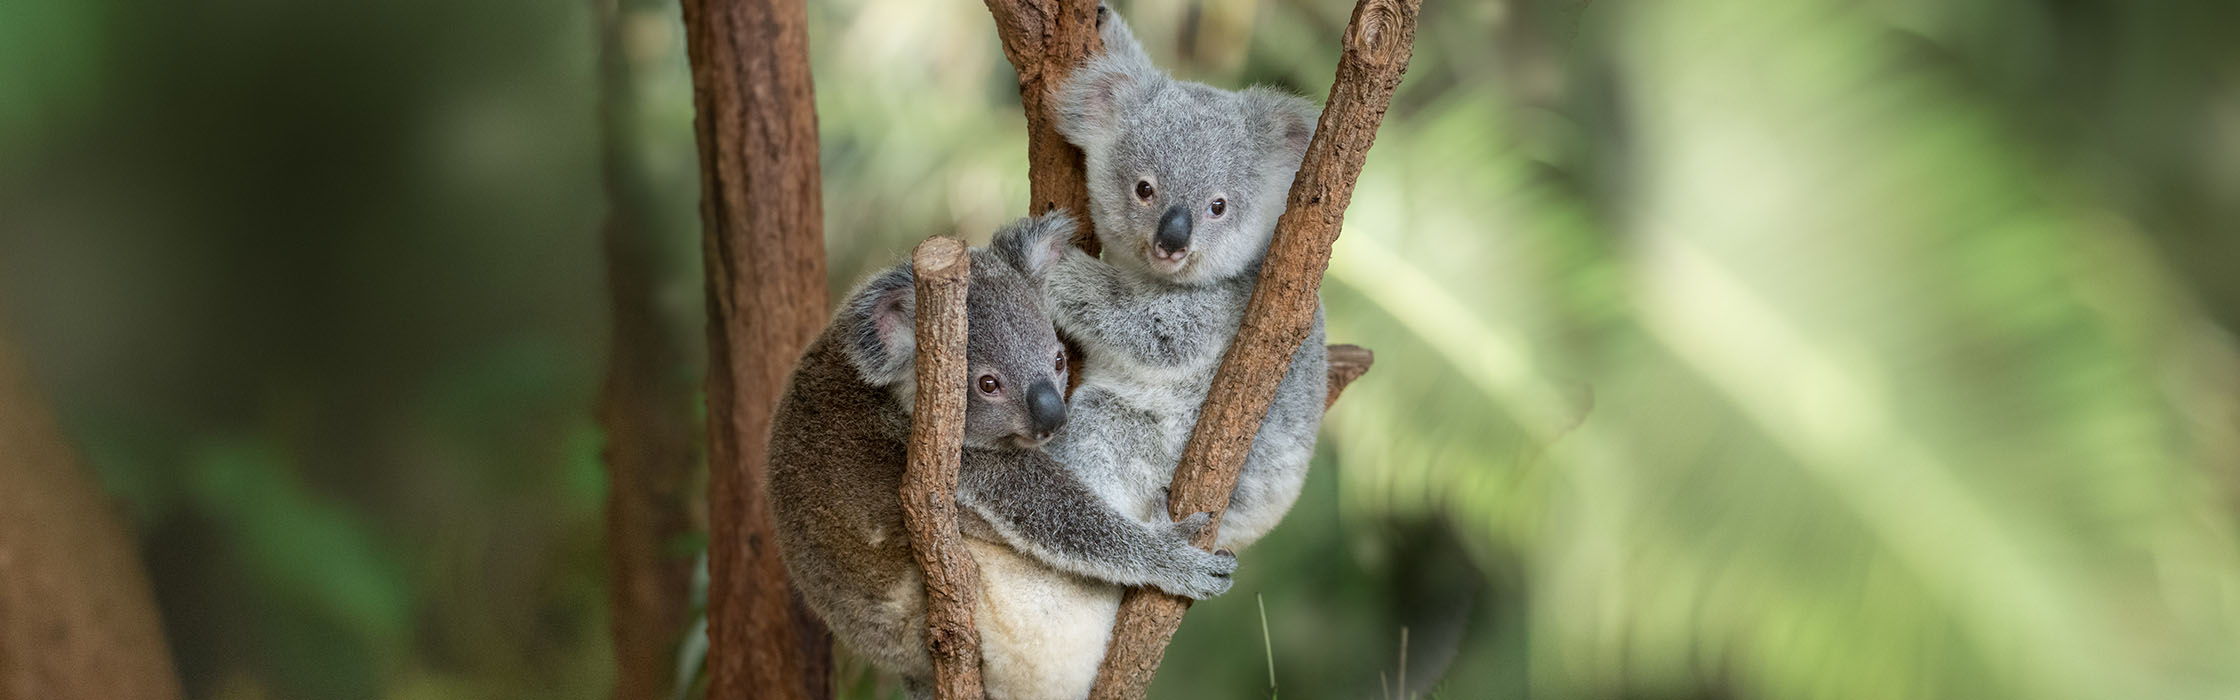 Support Wildlife - Adopt an Animal2240x700